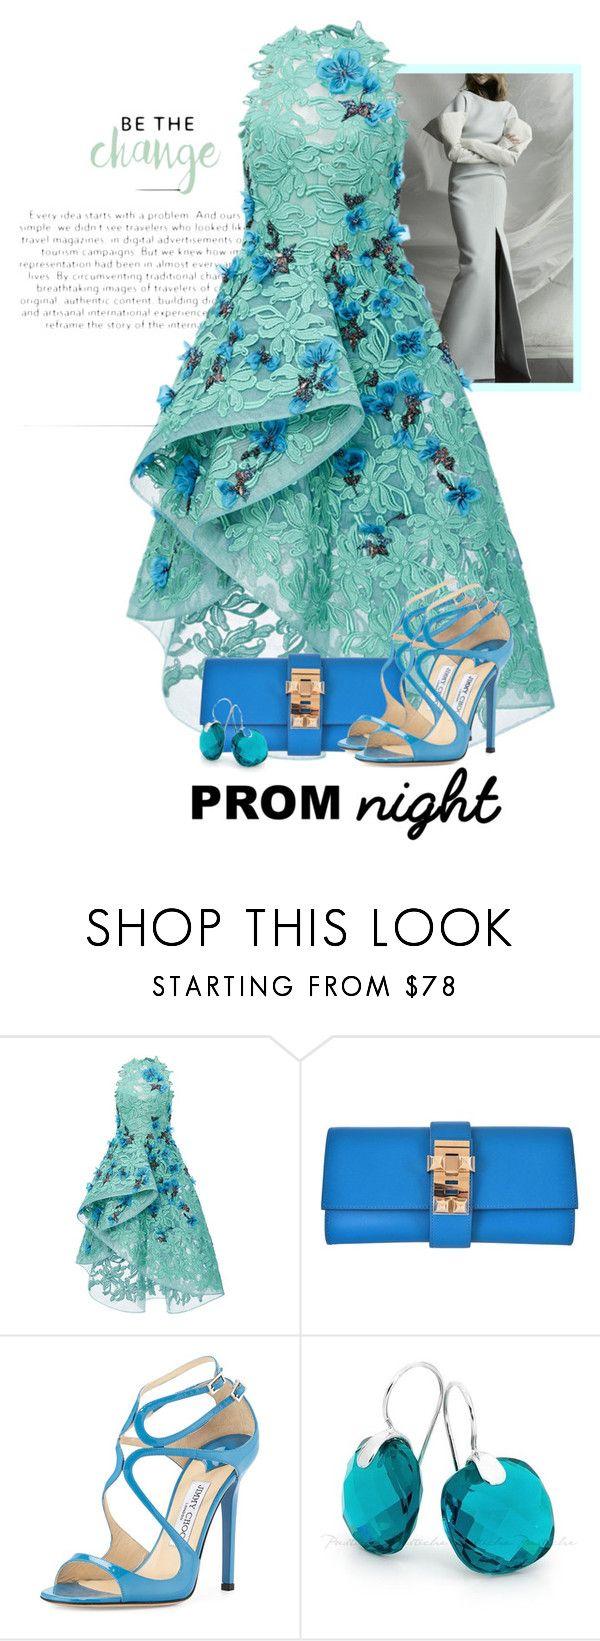 """Lace Dress!"" by flippintickledinc ❤ liked on Polyvore featuring Zac Posen, Hermès, Jimmy Choo and PROMNIGHT"